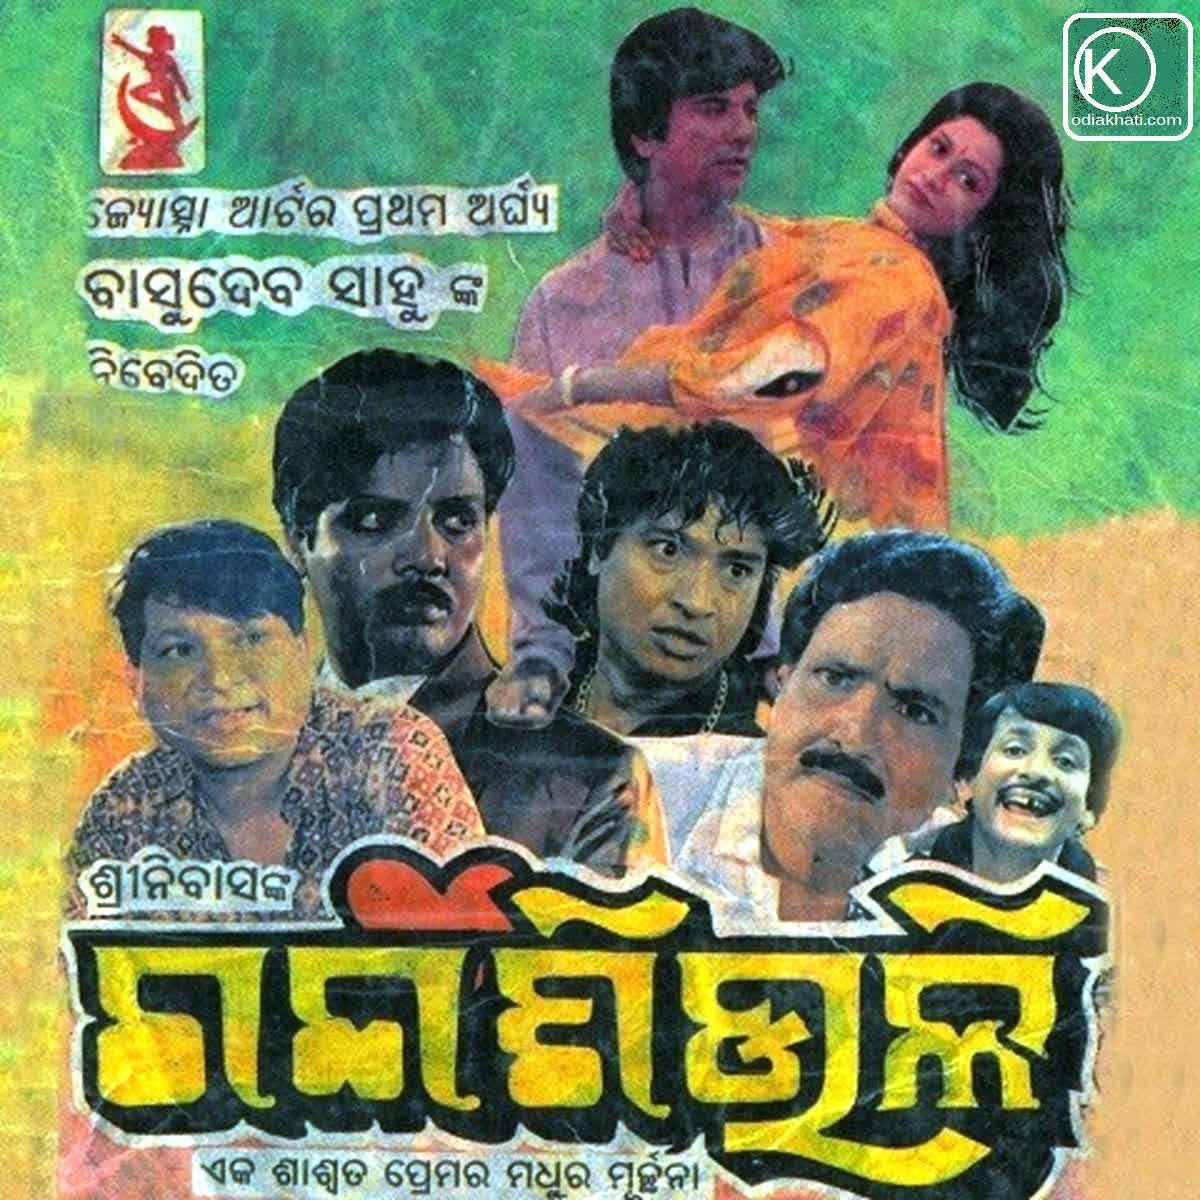 Jhure Sathi Bina Mana (Lopita Mishra)